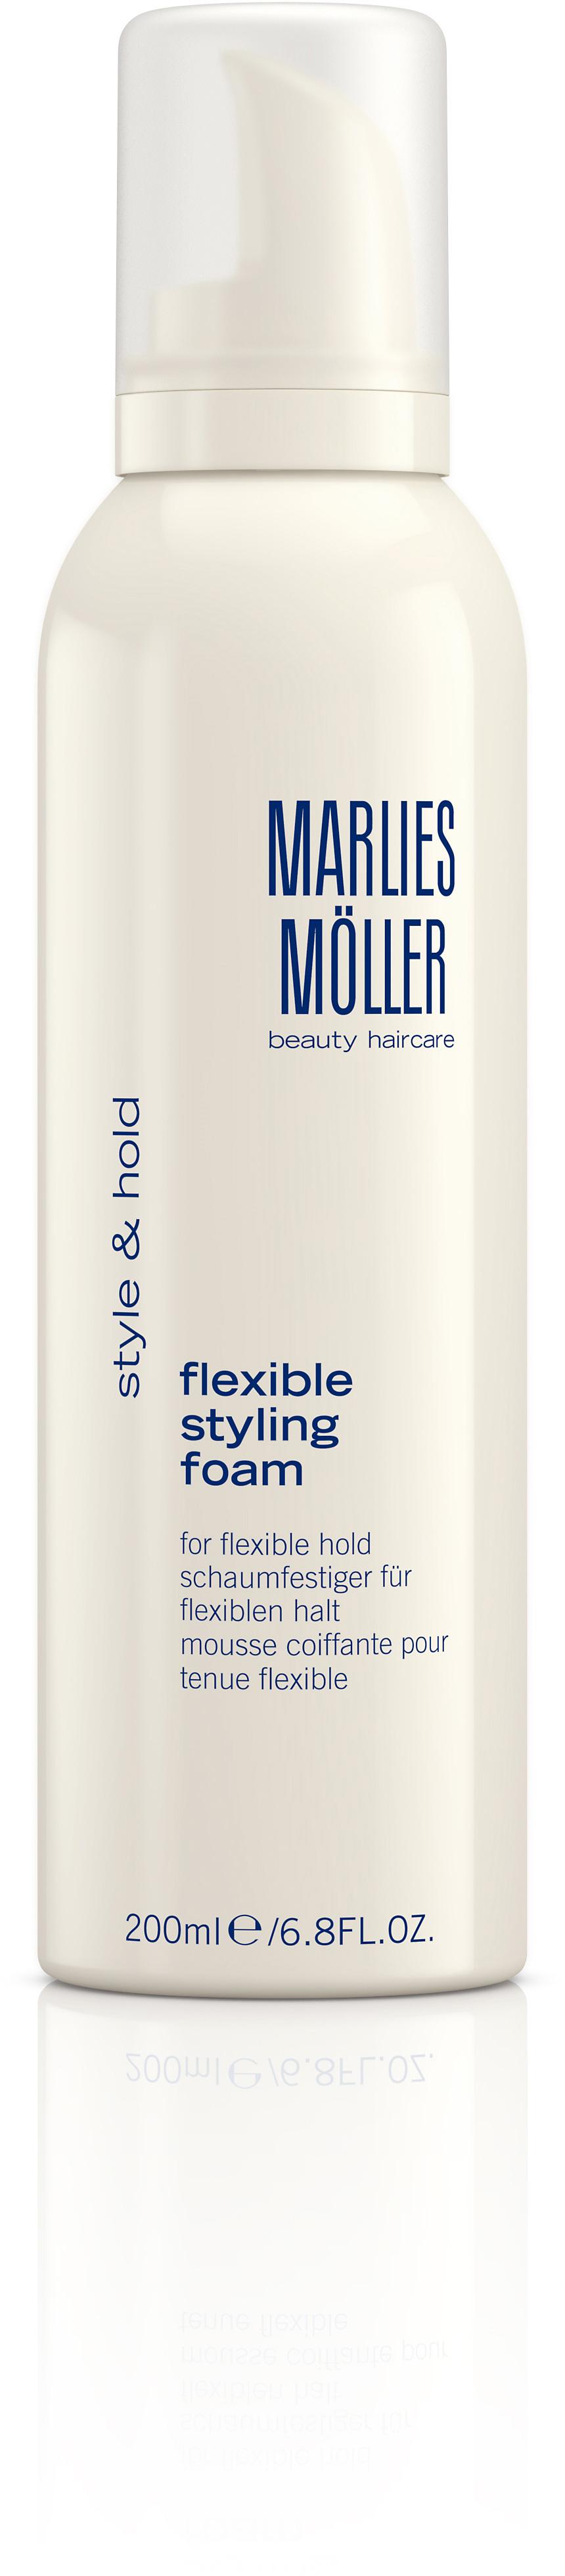 Marlies Möller Style Flexible Styling 200 ml